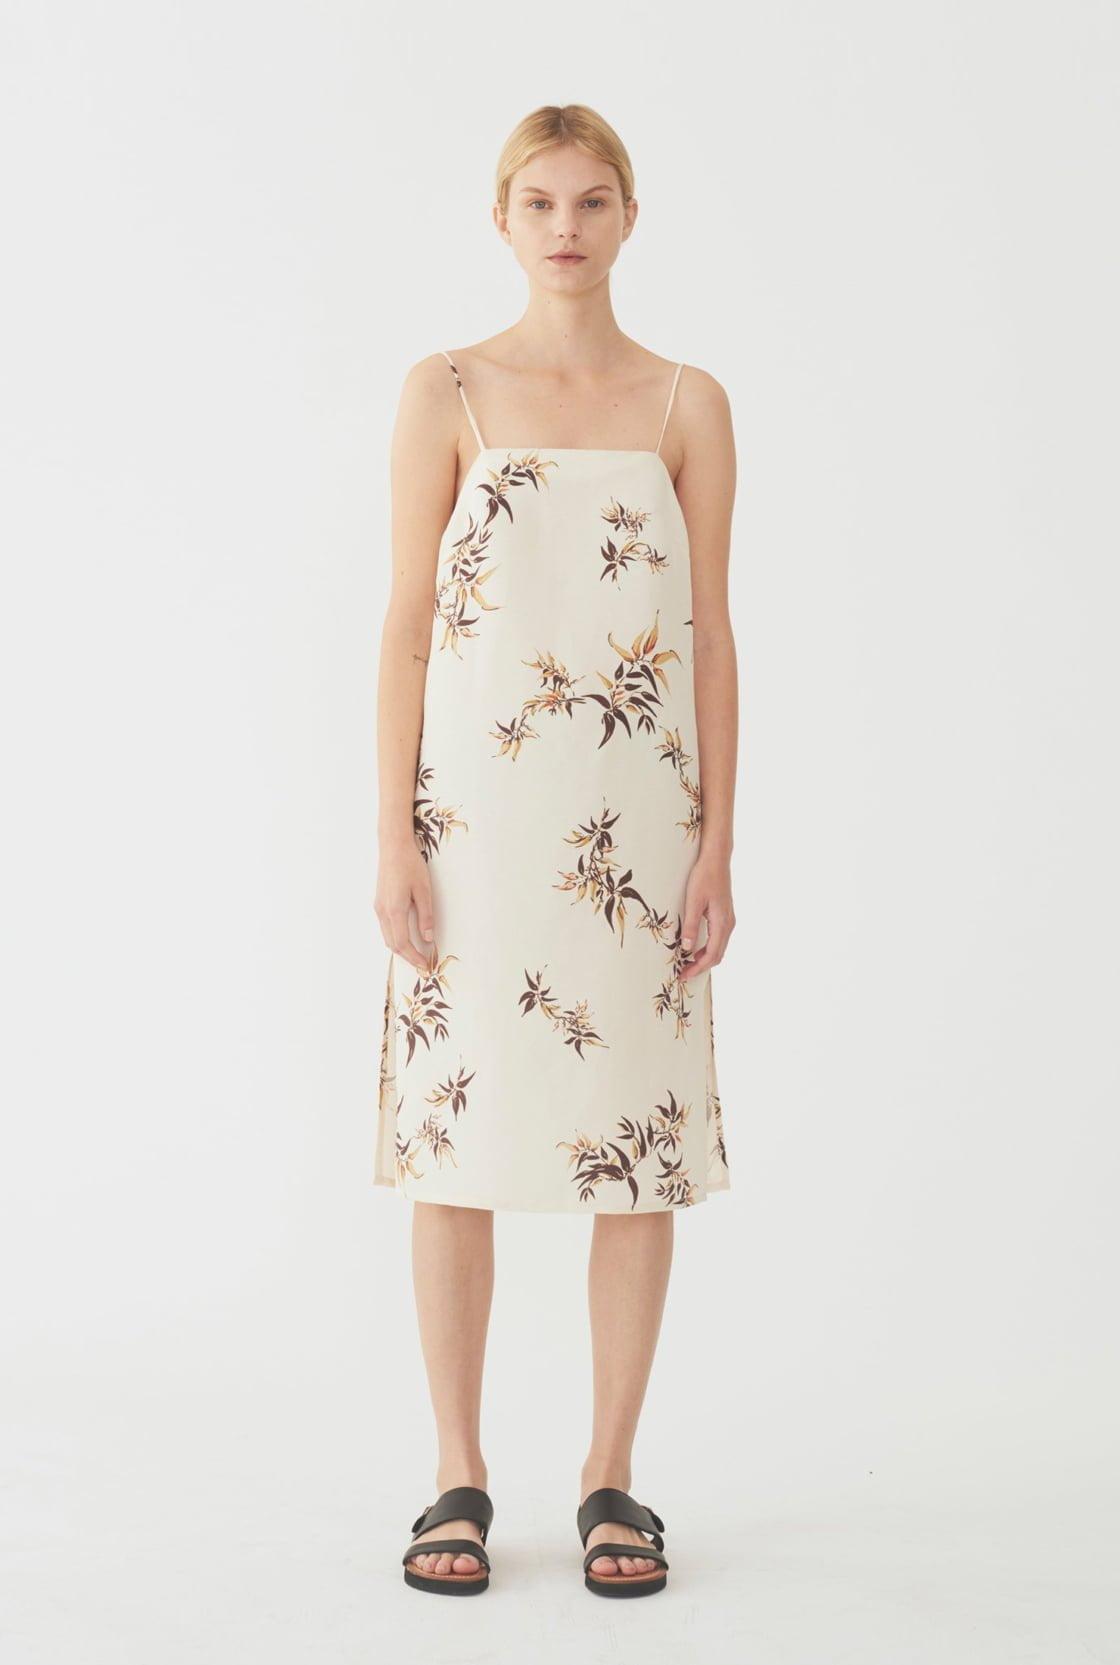 Linen Wedding Dress.Top 20 Casual Bridesmaids Dresses Hello May